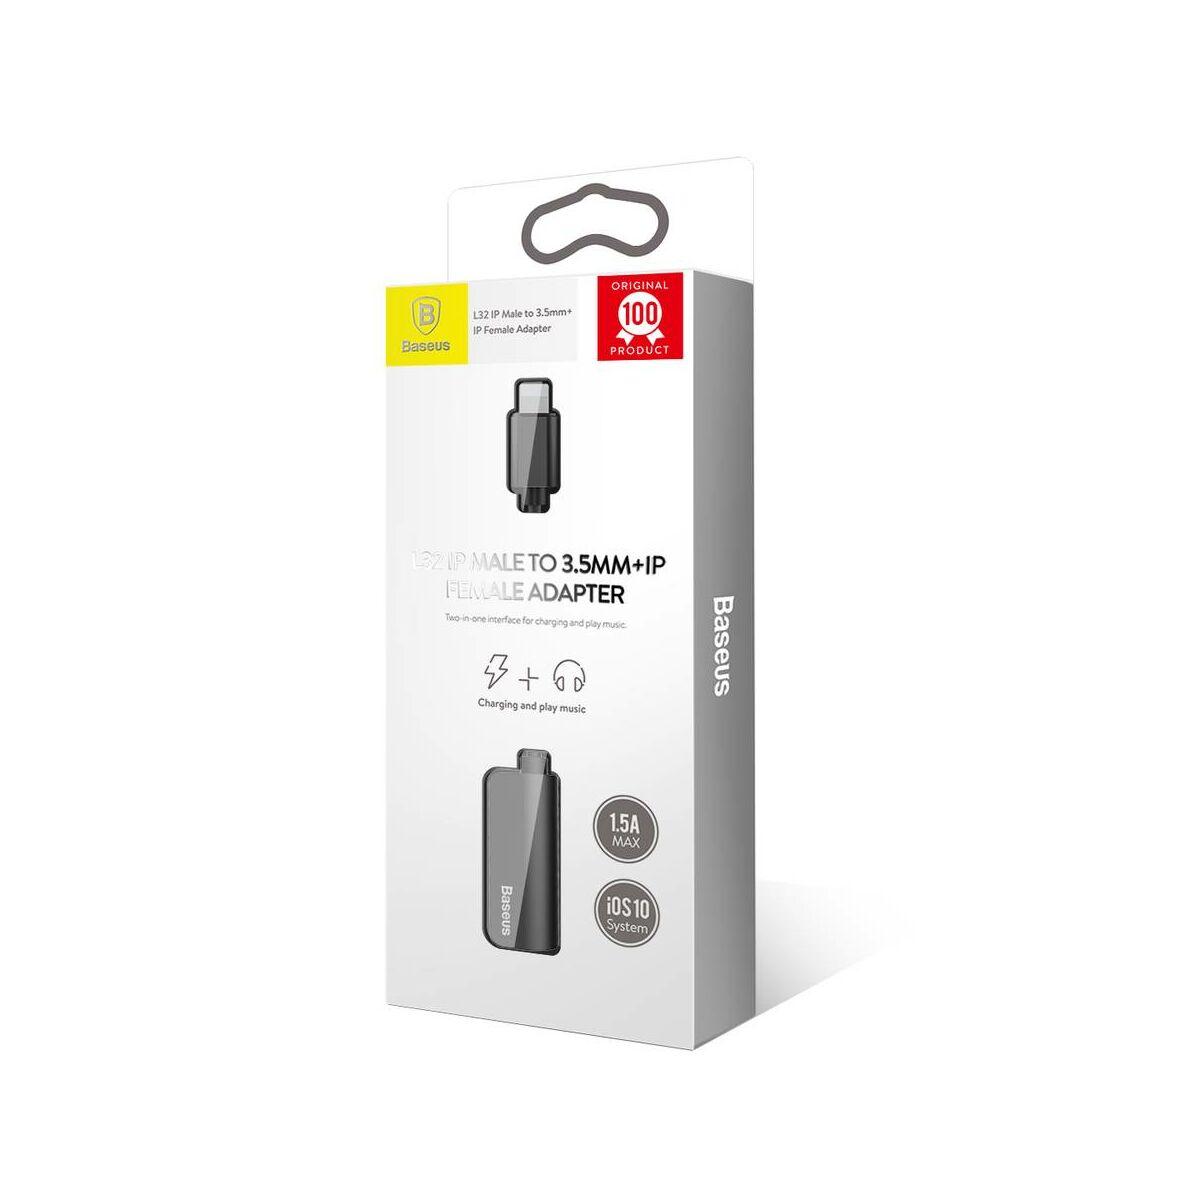 Baseus átalakító, L32 Lightning[apa] - 3.5 mm + Lightning[anya] adapter, fekete (CALL32-01)